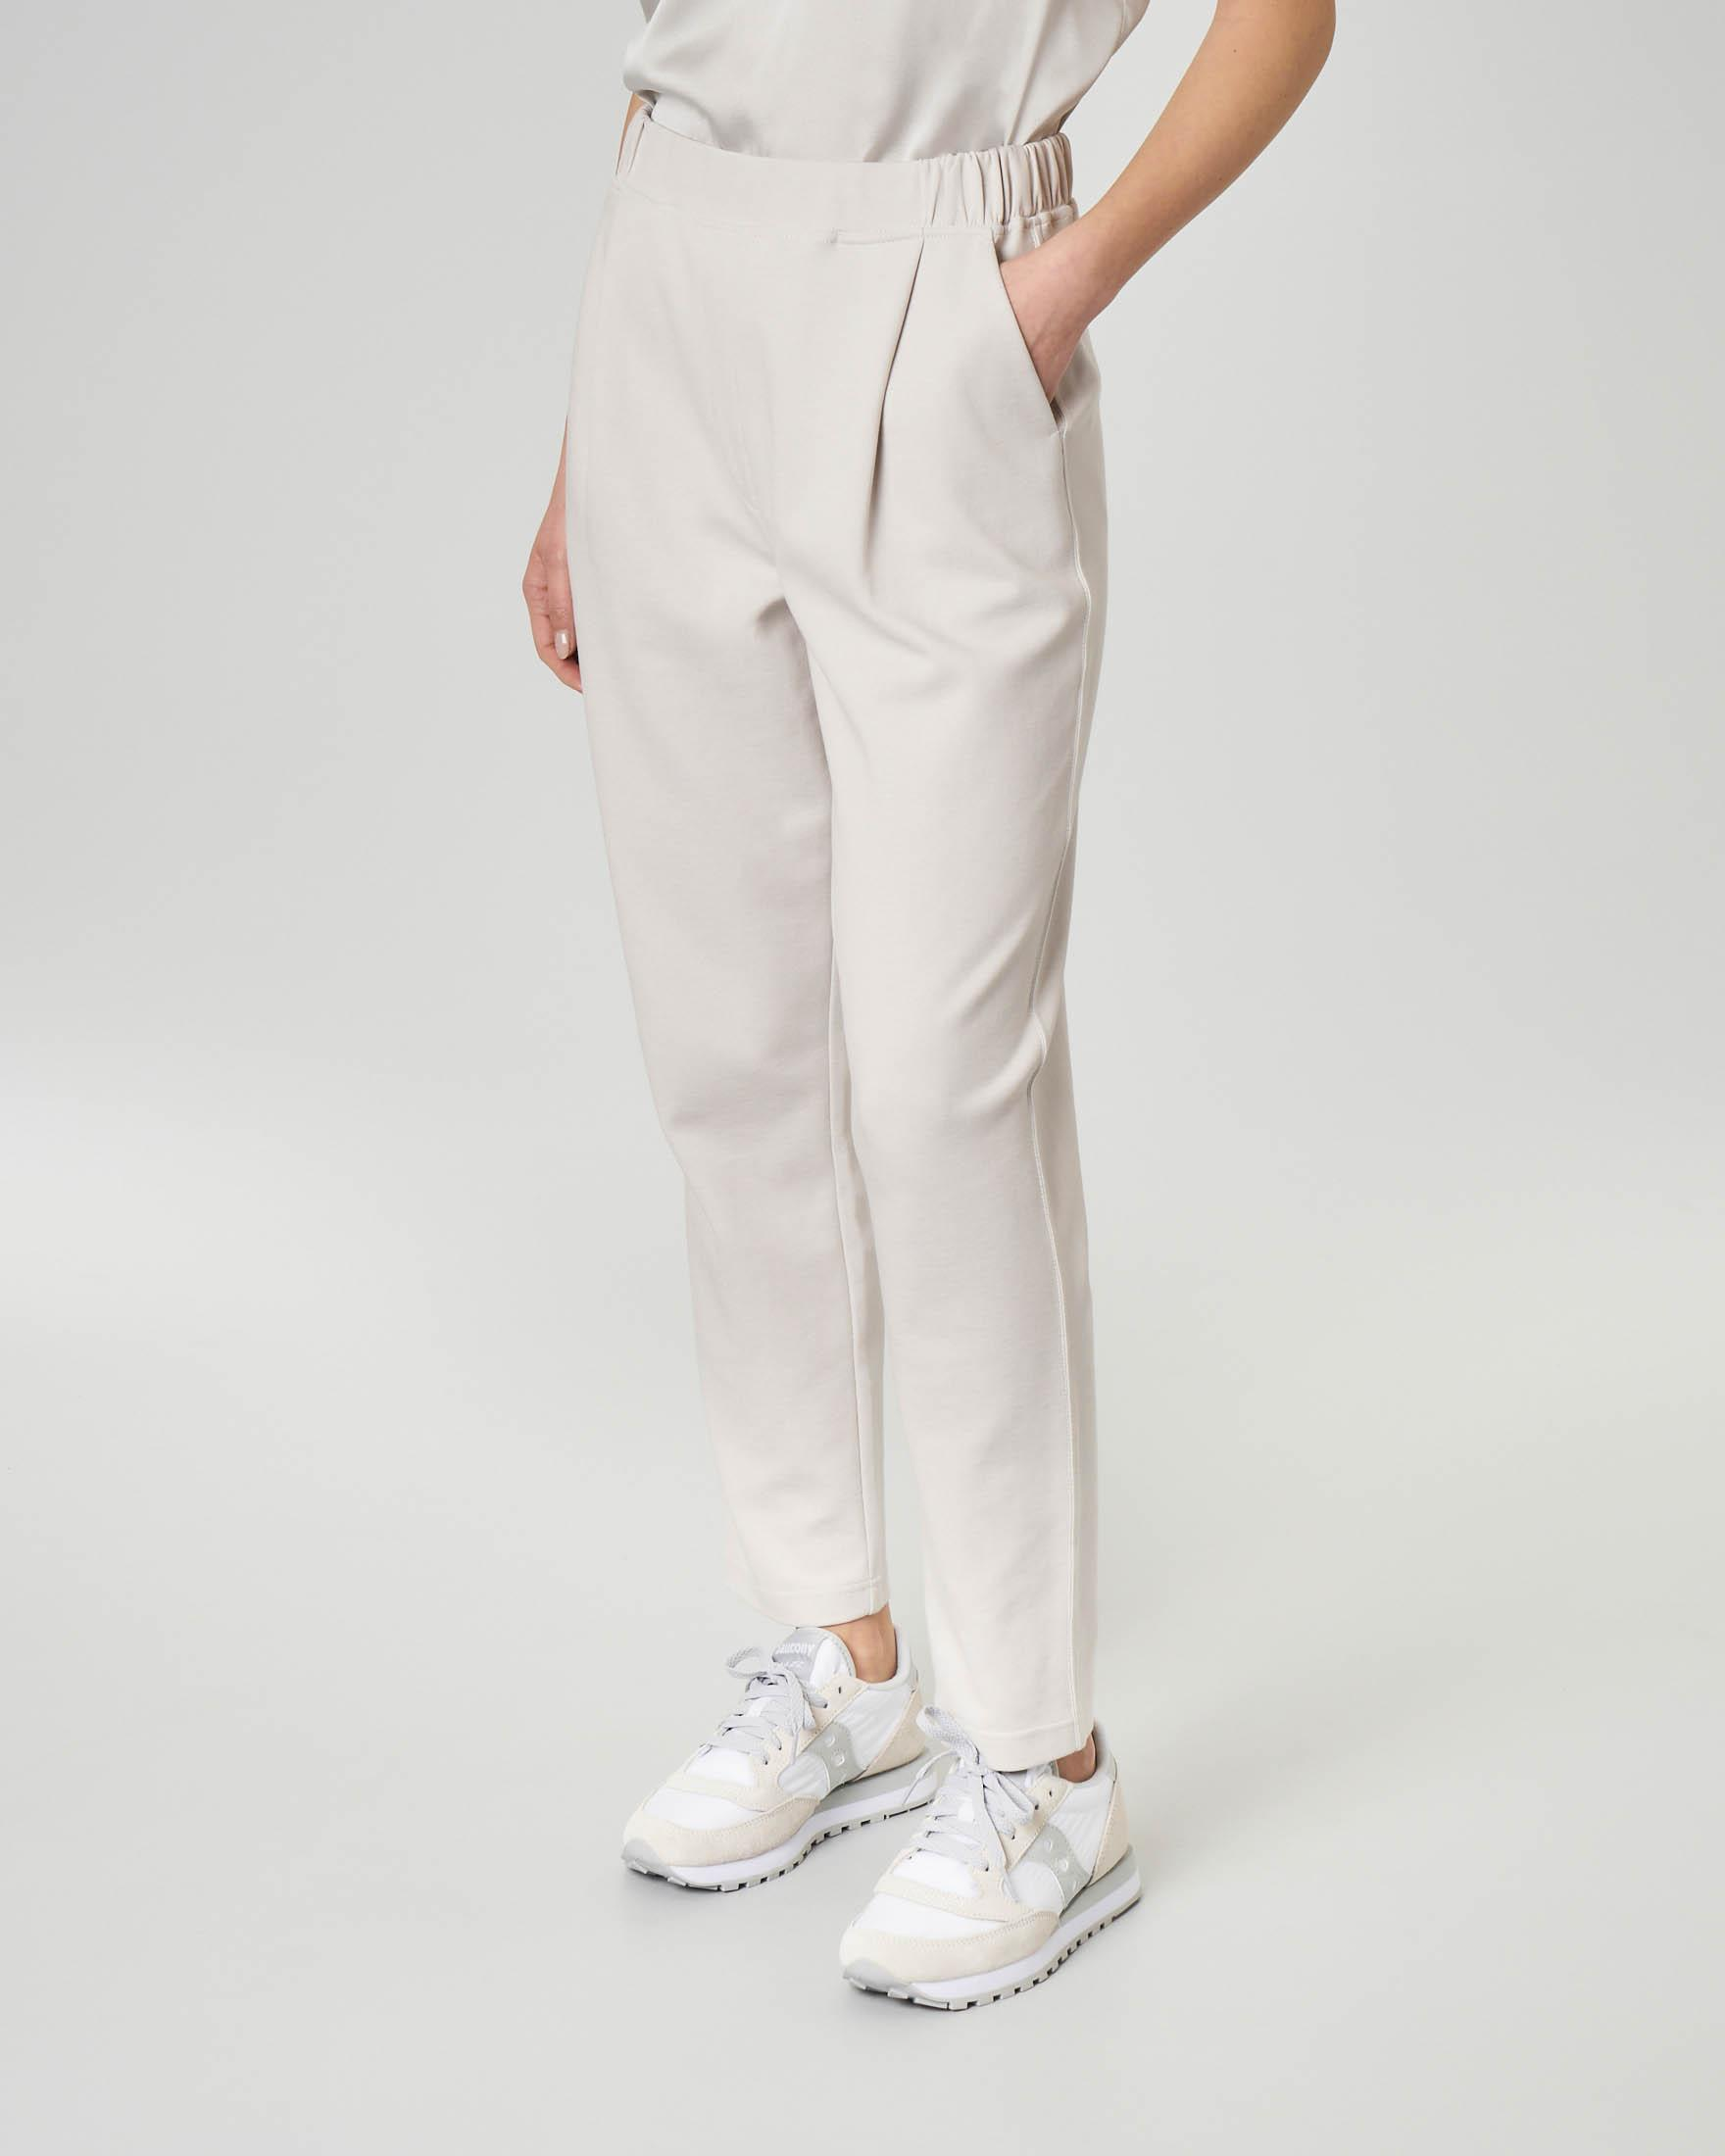 Pantaloni in felpa color gesso